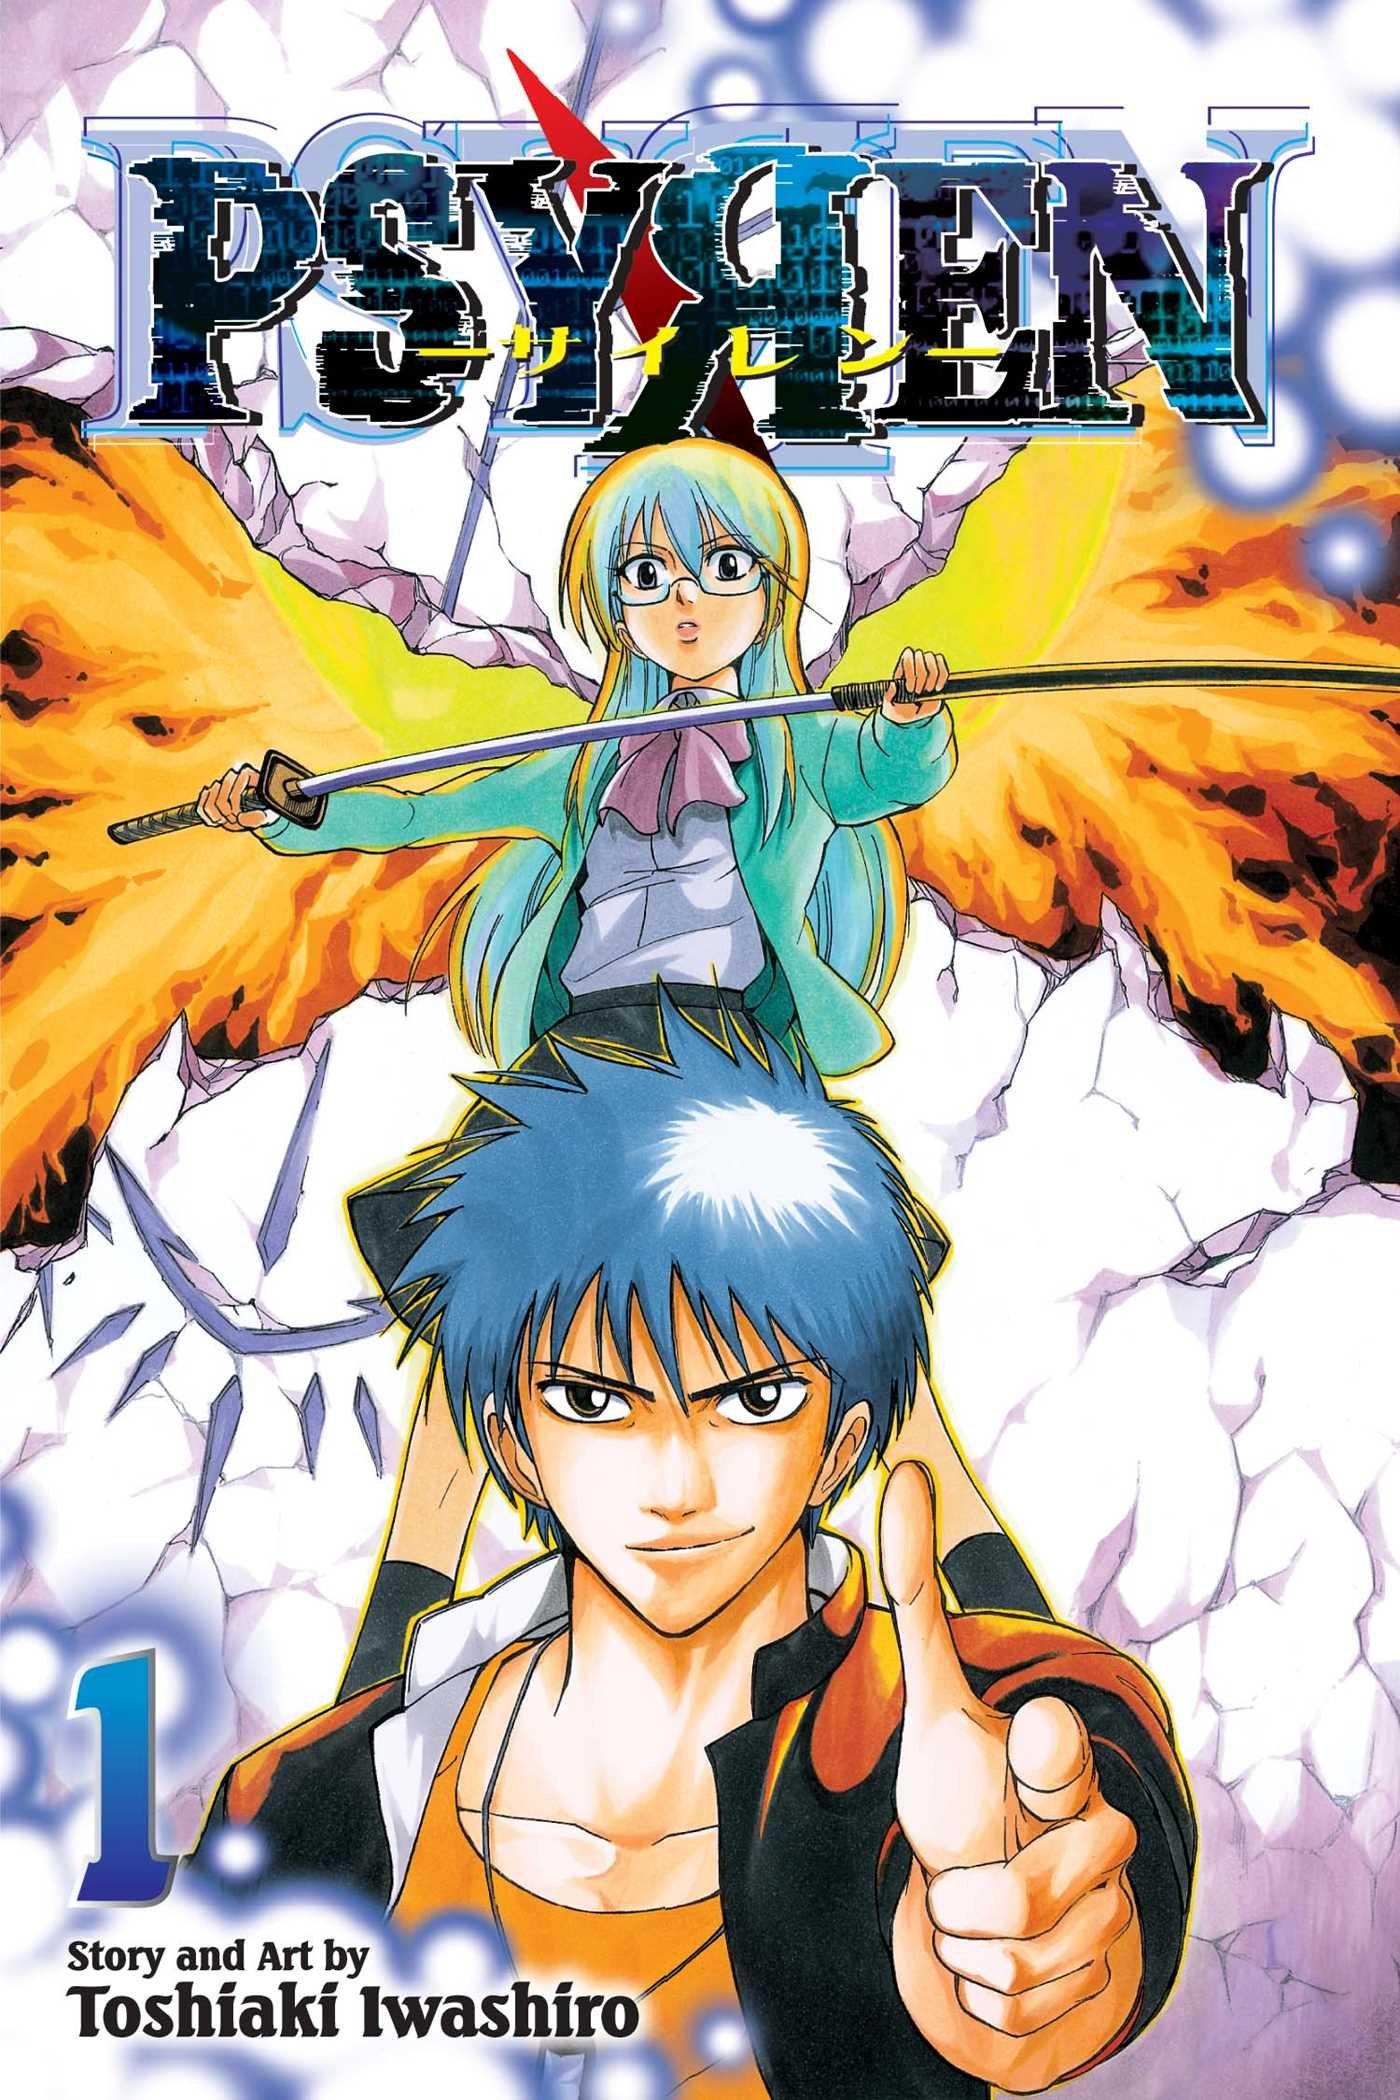 Amazon.com: Psyren, Vol. 1 (1) (9781421536767): Toshiaki Iwashiro, Toshiaki  Iwashiro, Camellia Nieh: Books